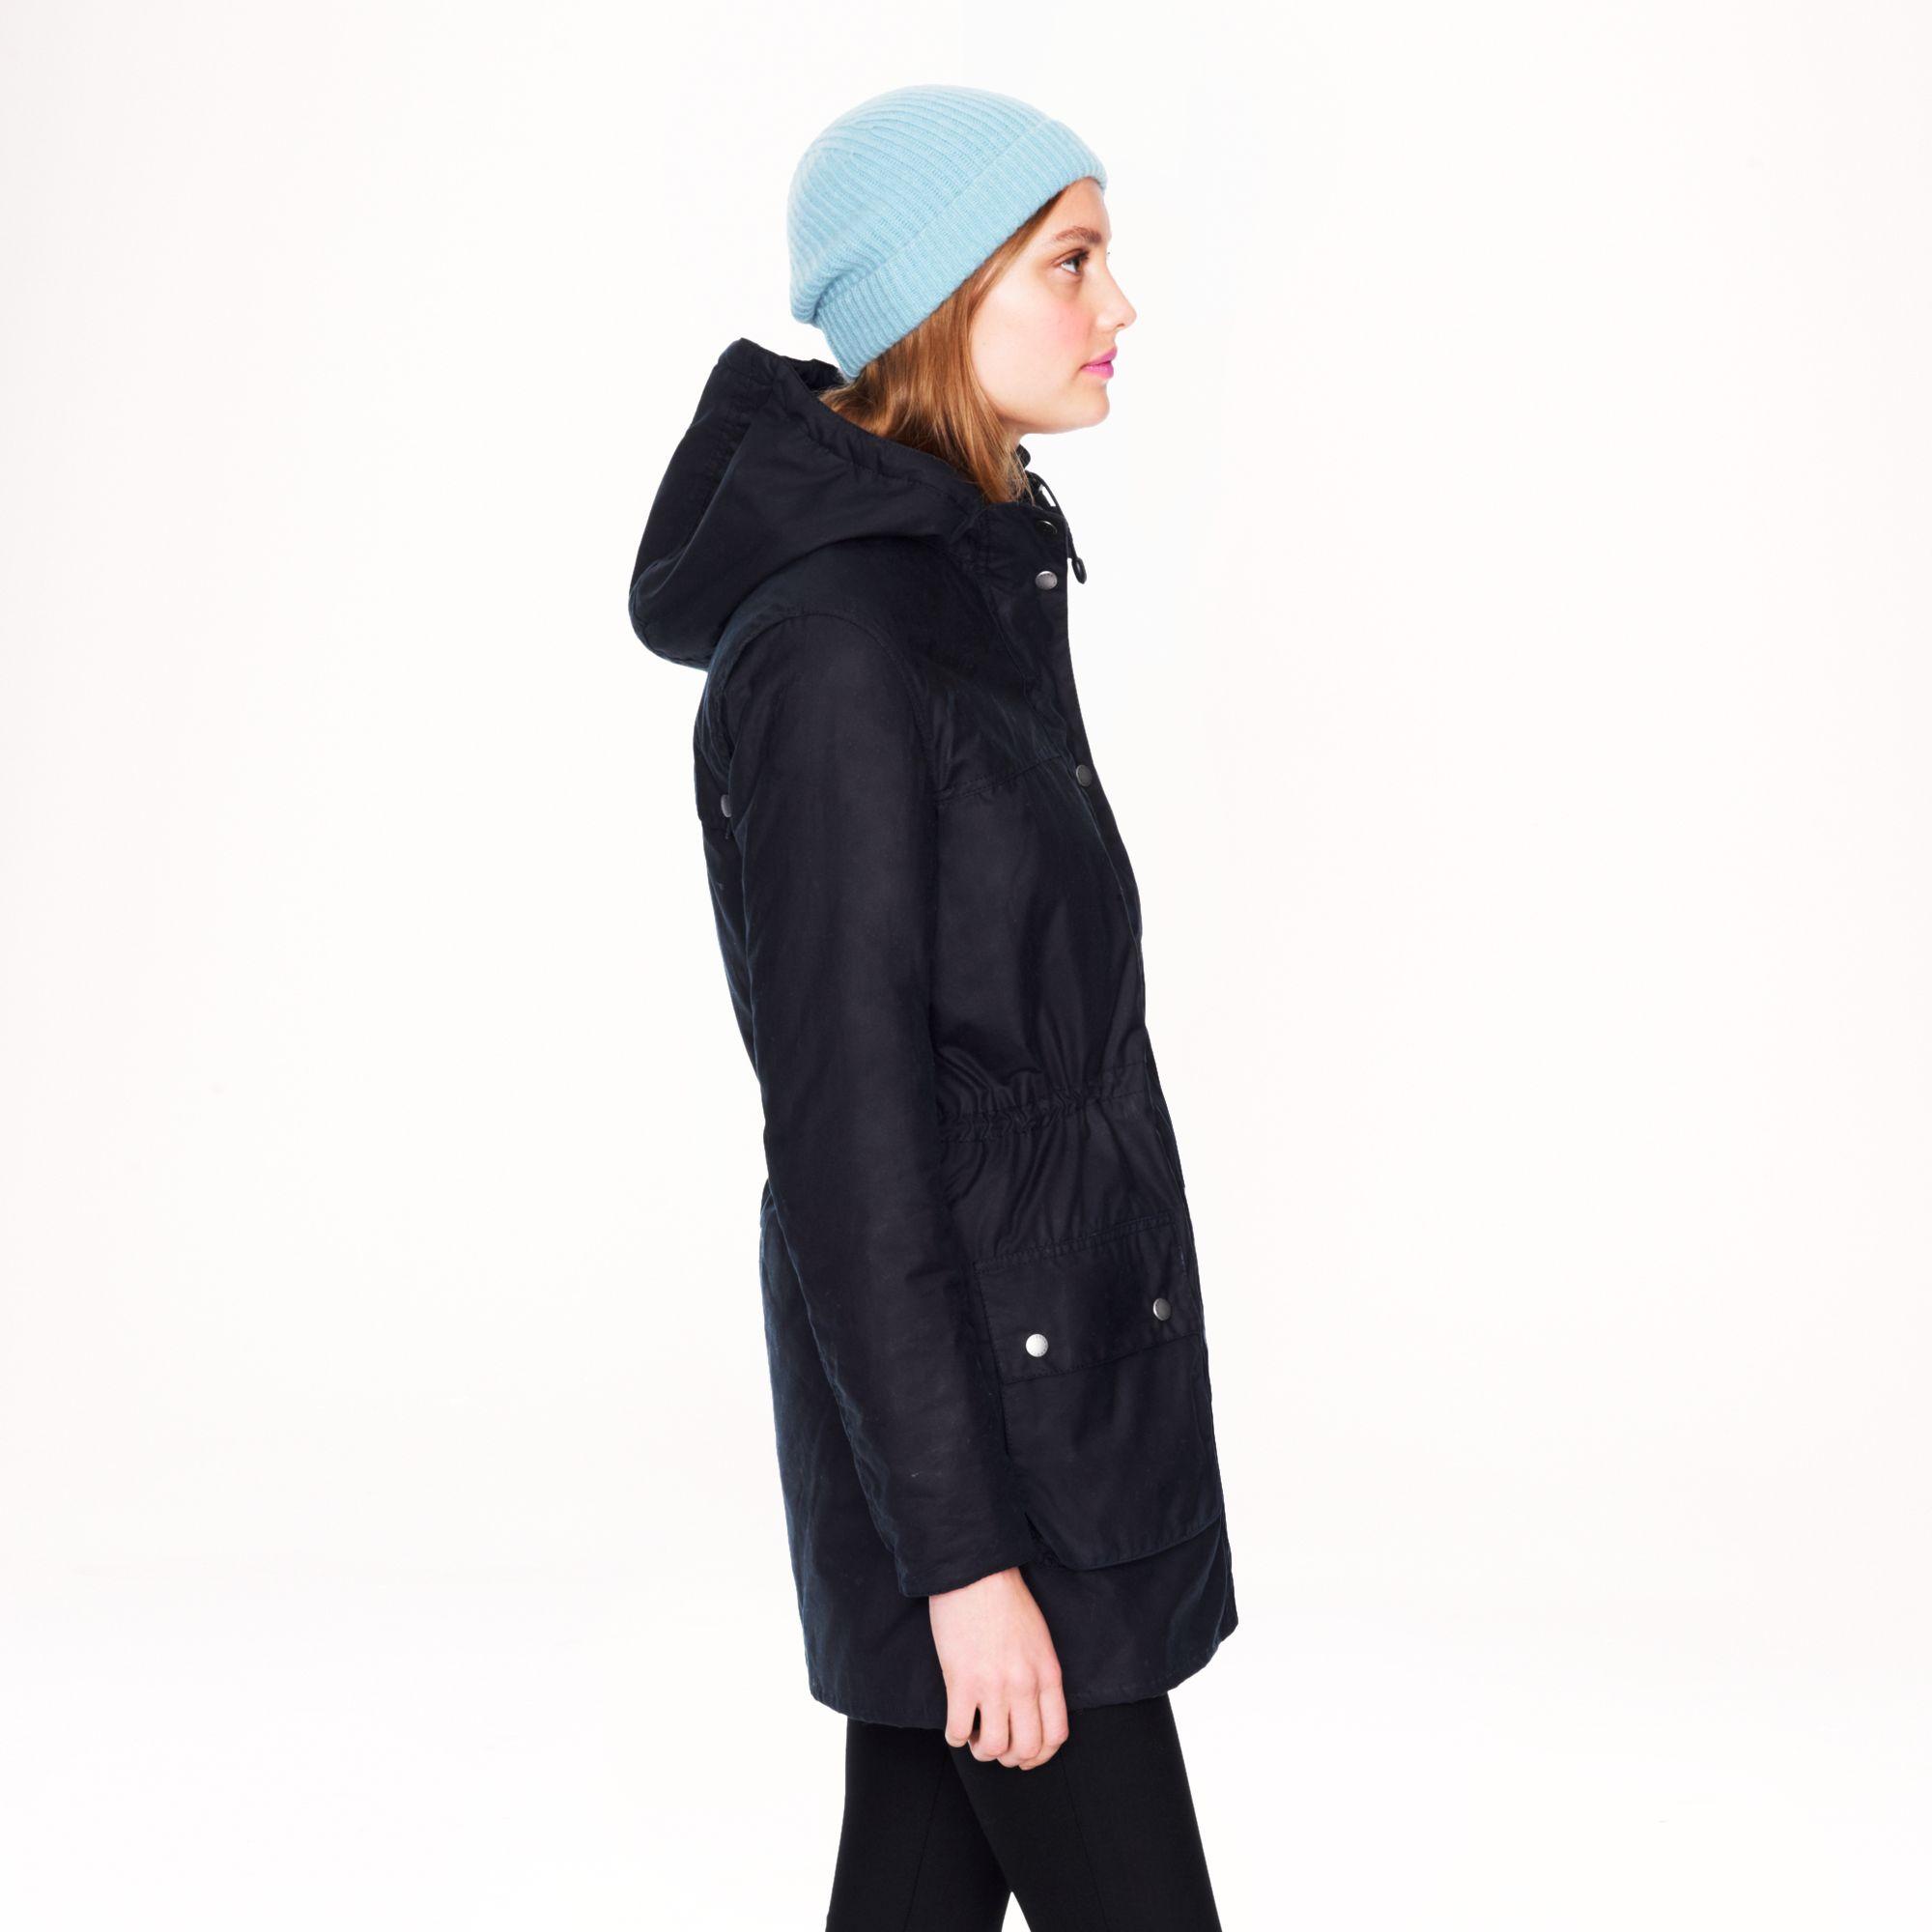 Lyst - J.Crew Barbour Winter Durham Jacket in Blue 2ed027bbf